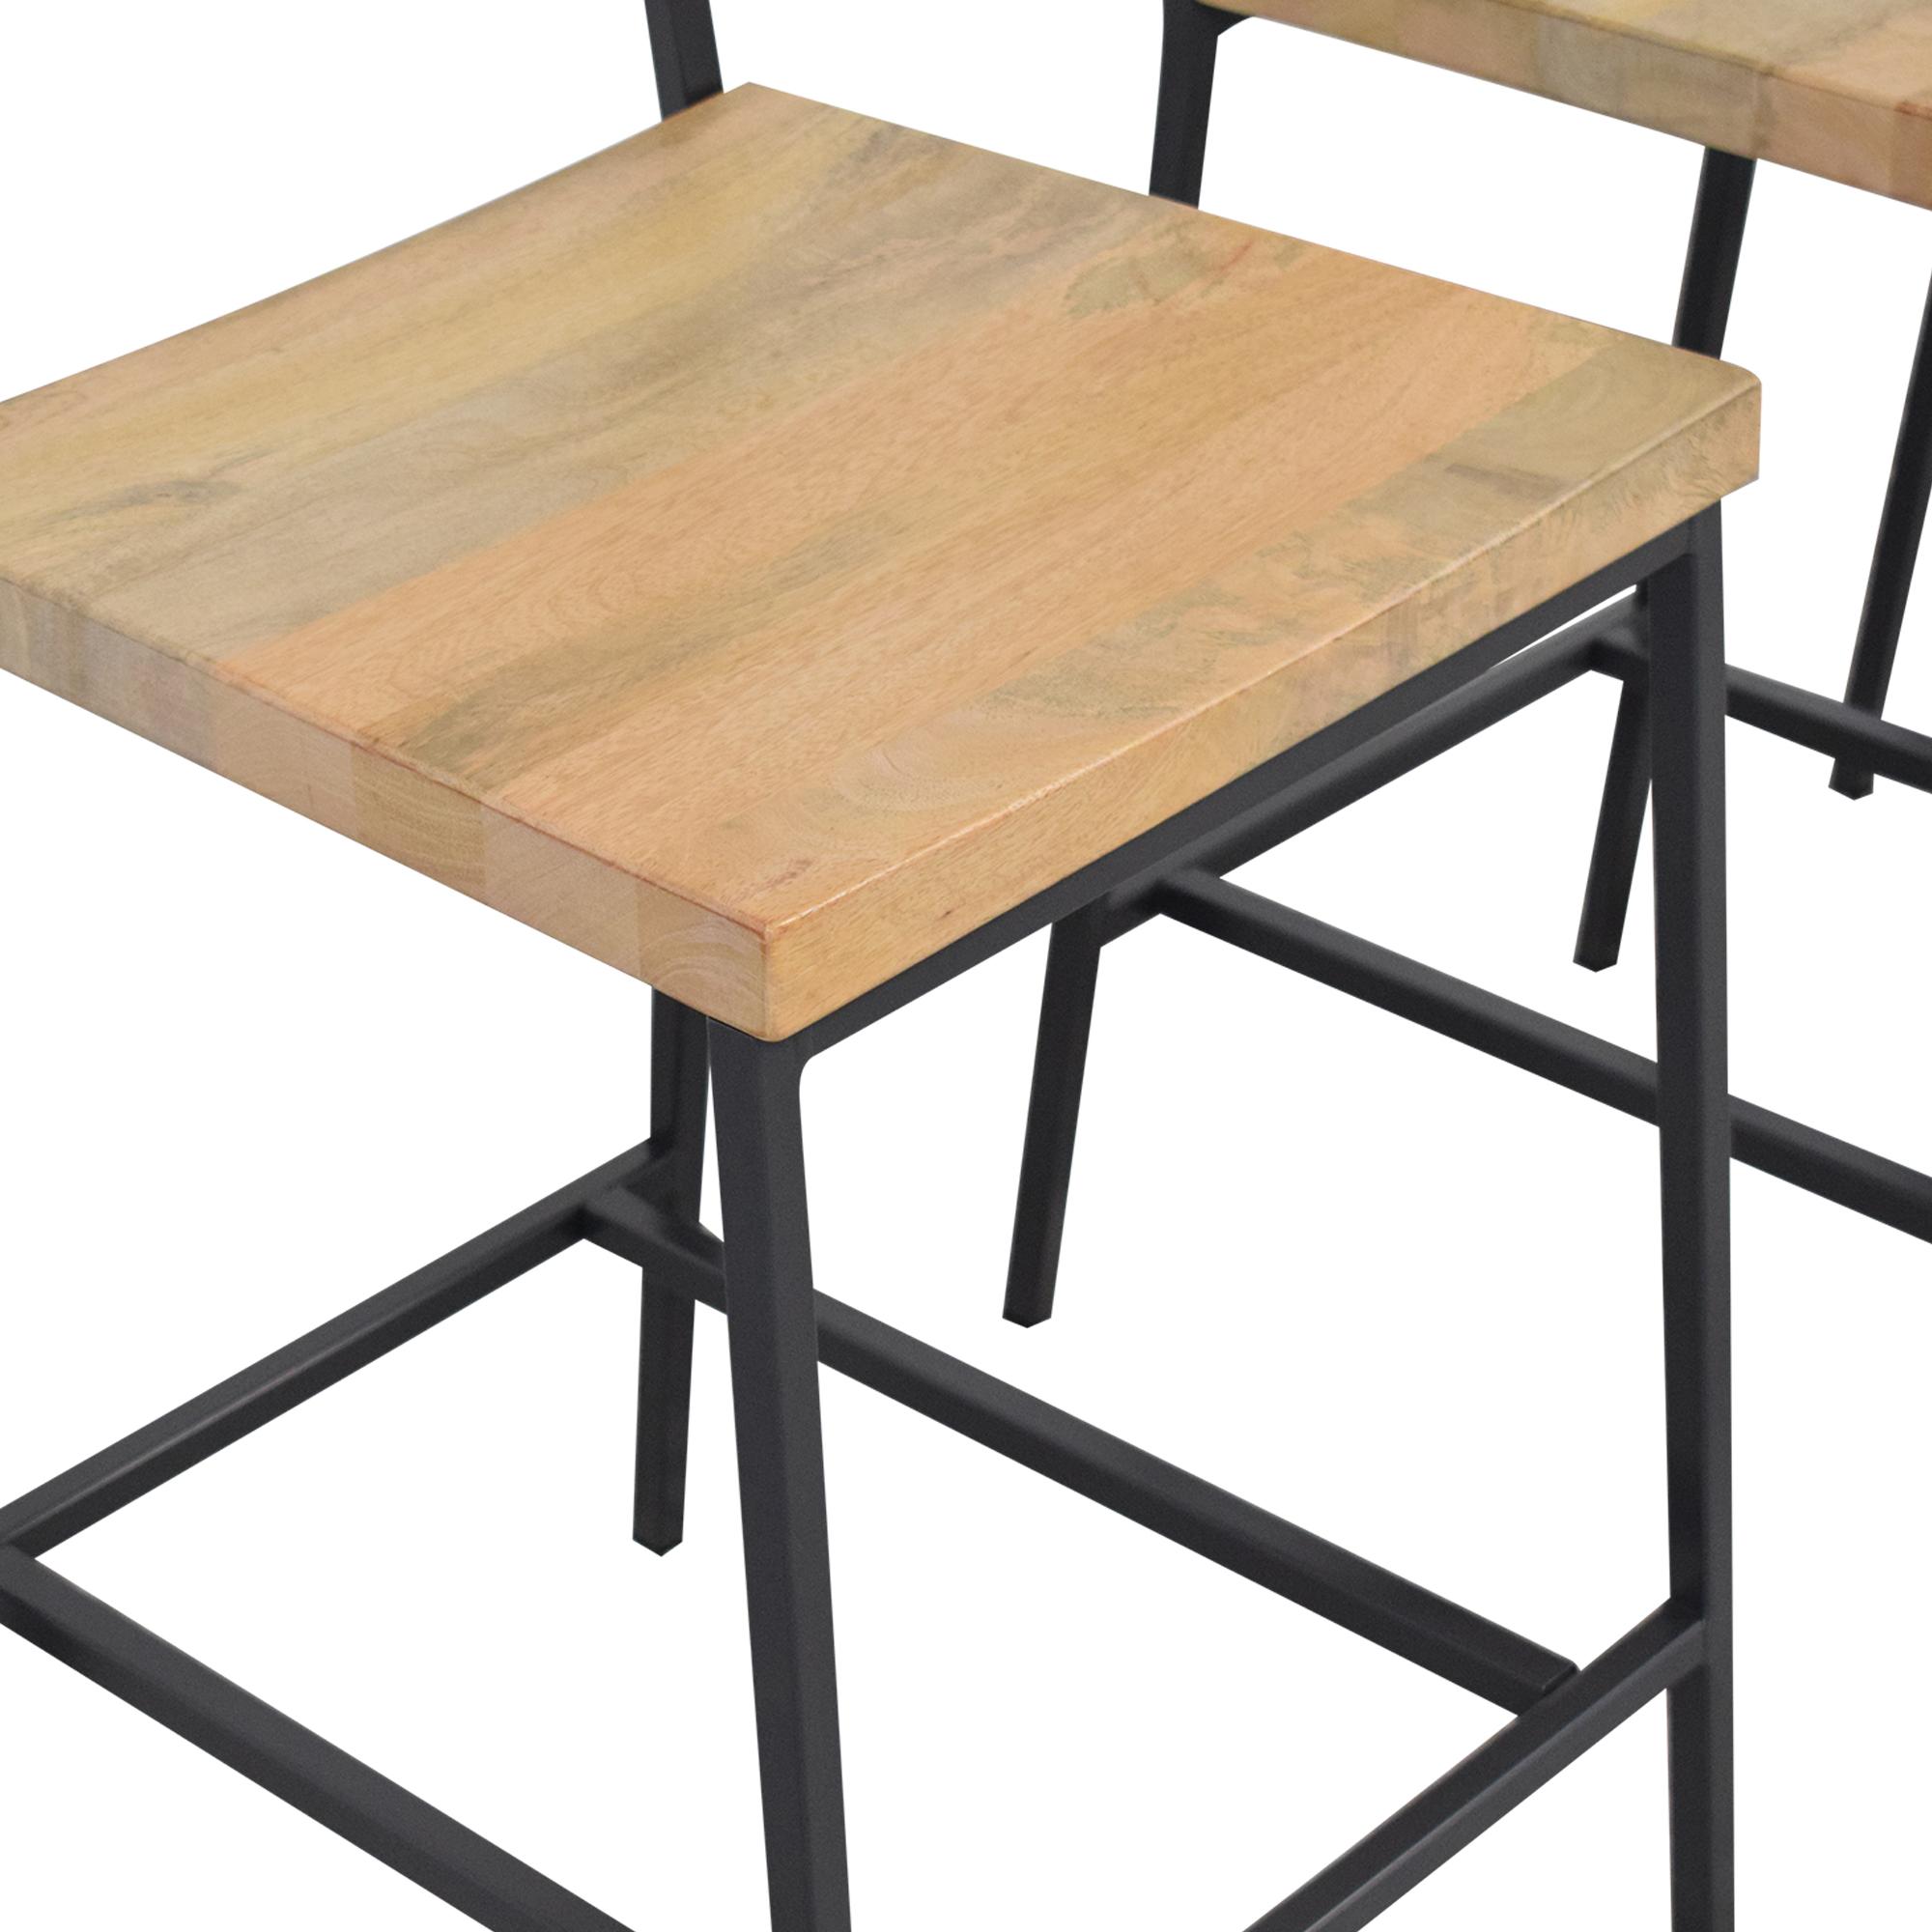 West Elm Rustic Bar Stools Mango Wood / Chairs